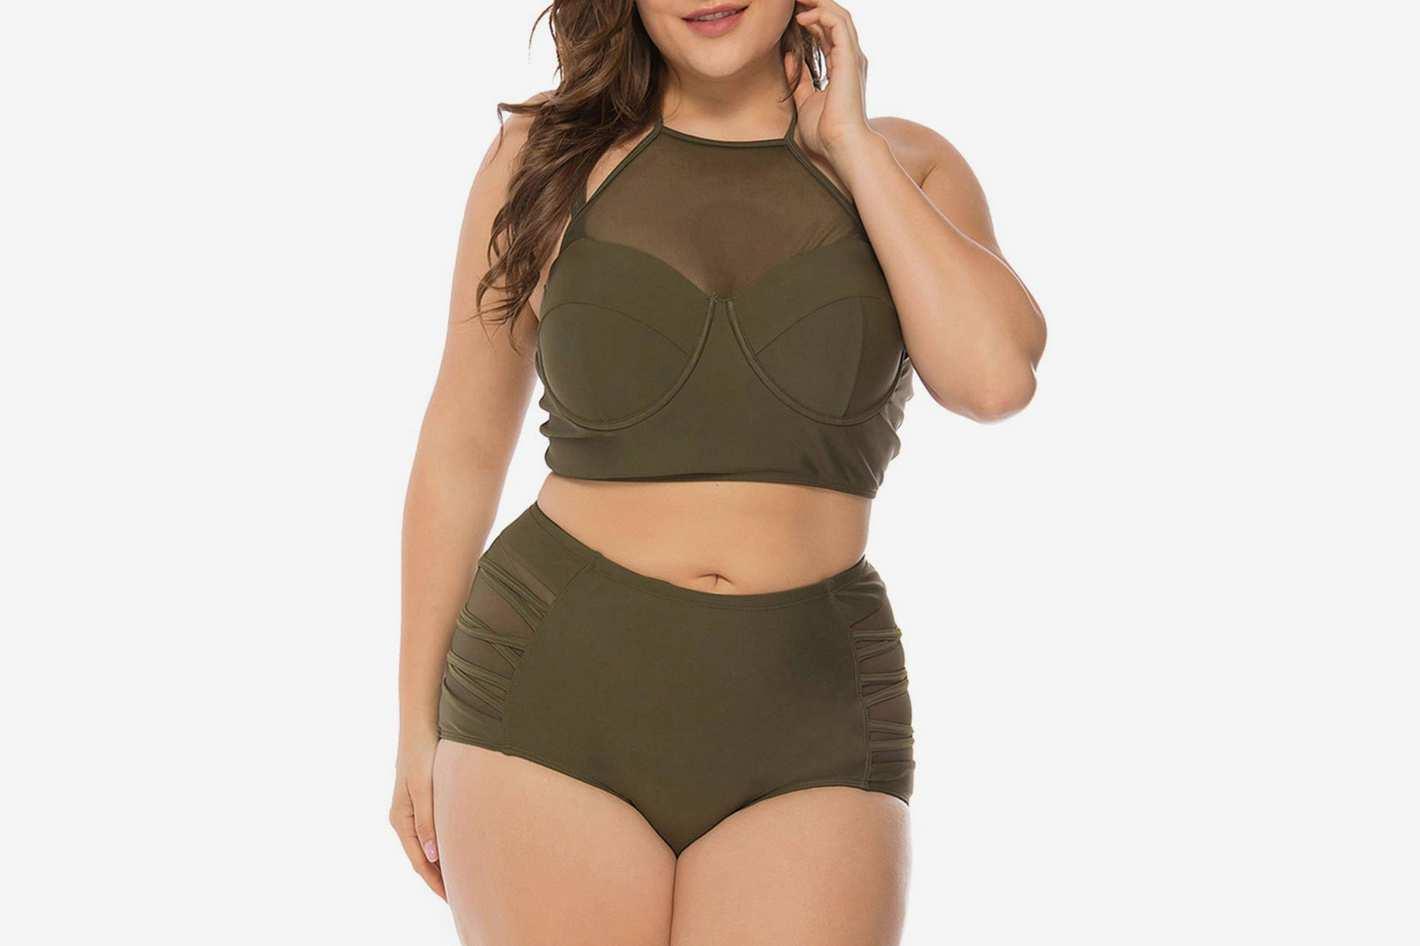 FeelinGirl Plus Size Mesh Two Piece Swimsuit